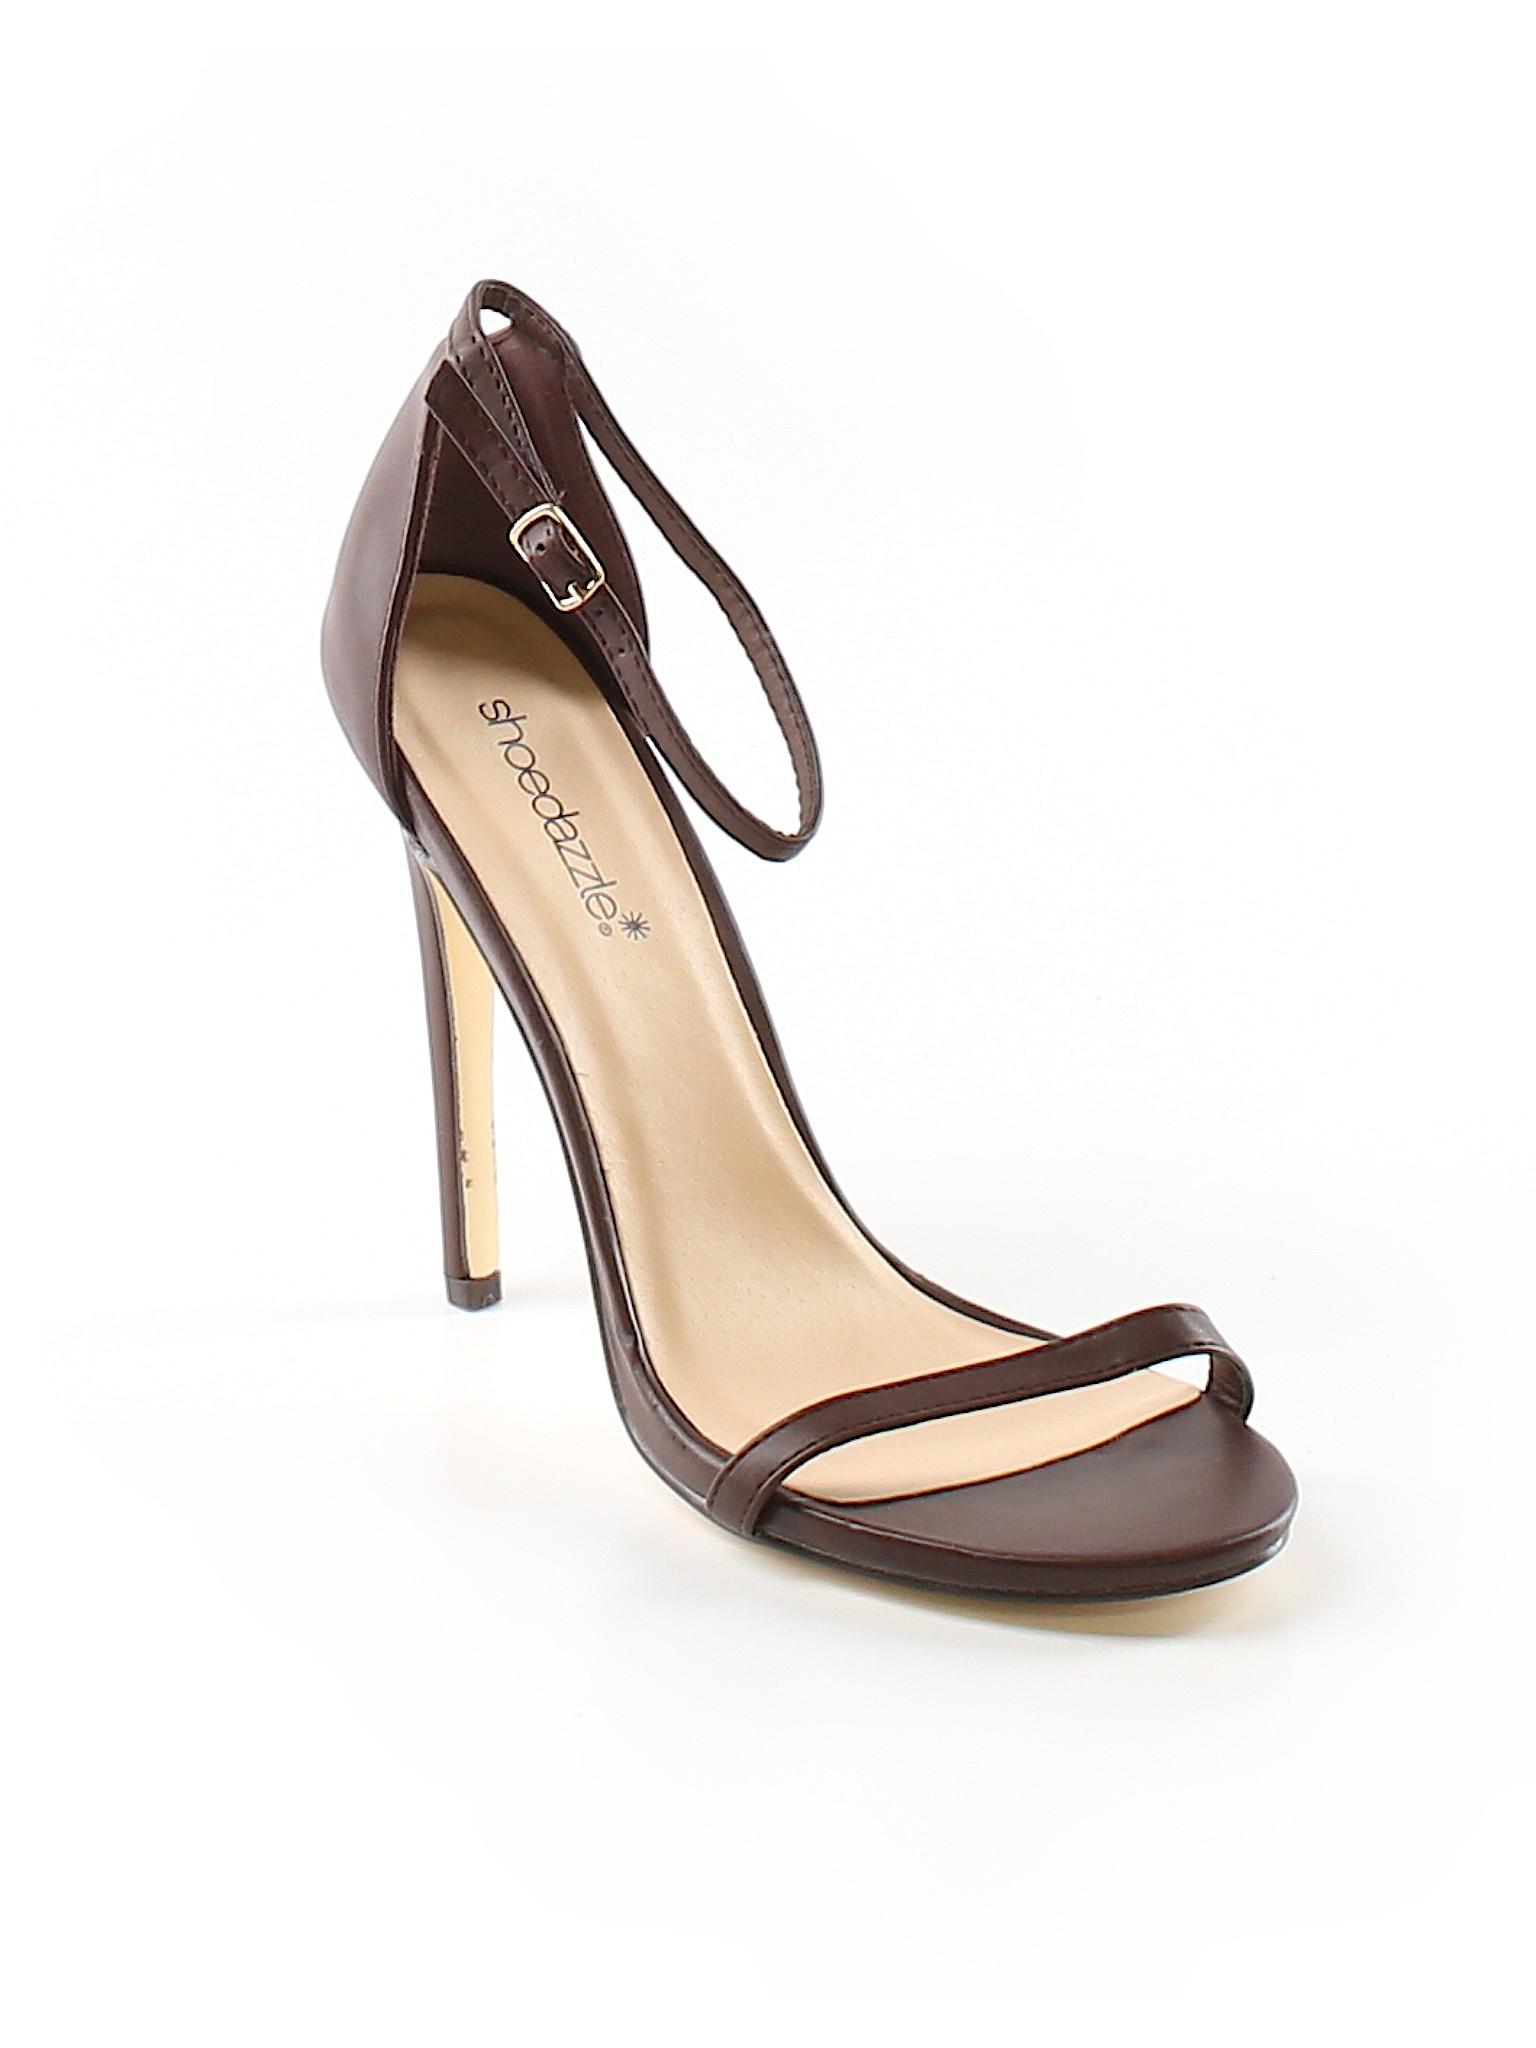 Boutique Boutique promotion promotion Shoedazzle promotion Shoedazzle Boutique Heels Shoedazzle Heels q0CdWnFAW